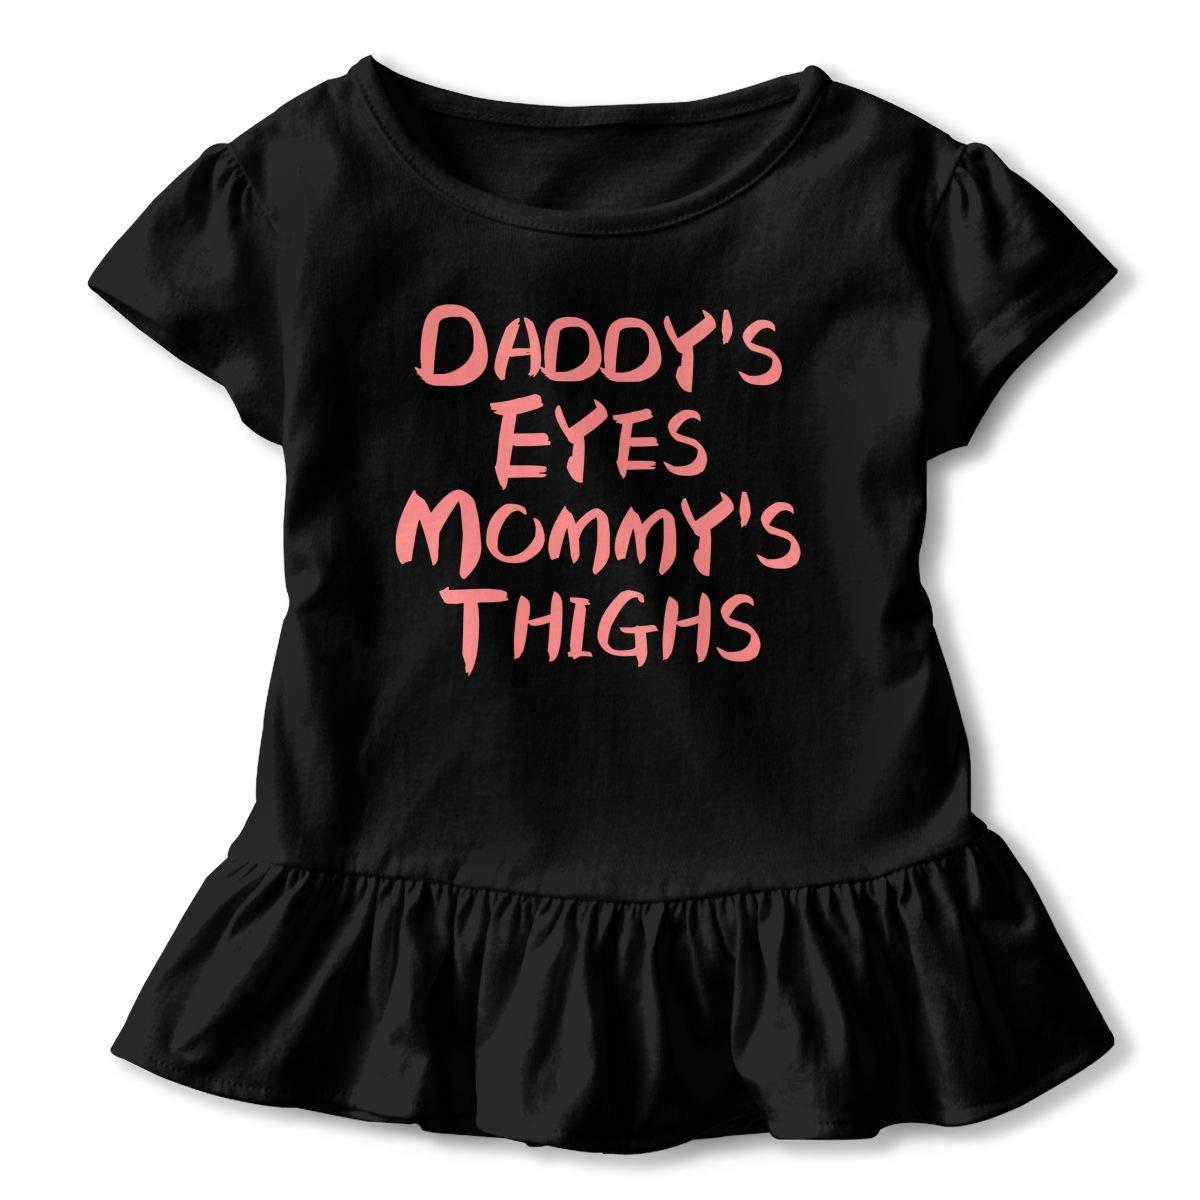 Mommys Thighs Toddler Girls T Shirt Kids Cotton Short Sleeve Ruffle Tee Cheng Jian Bo Daddys Eyes